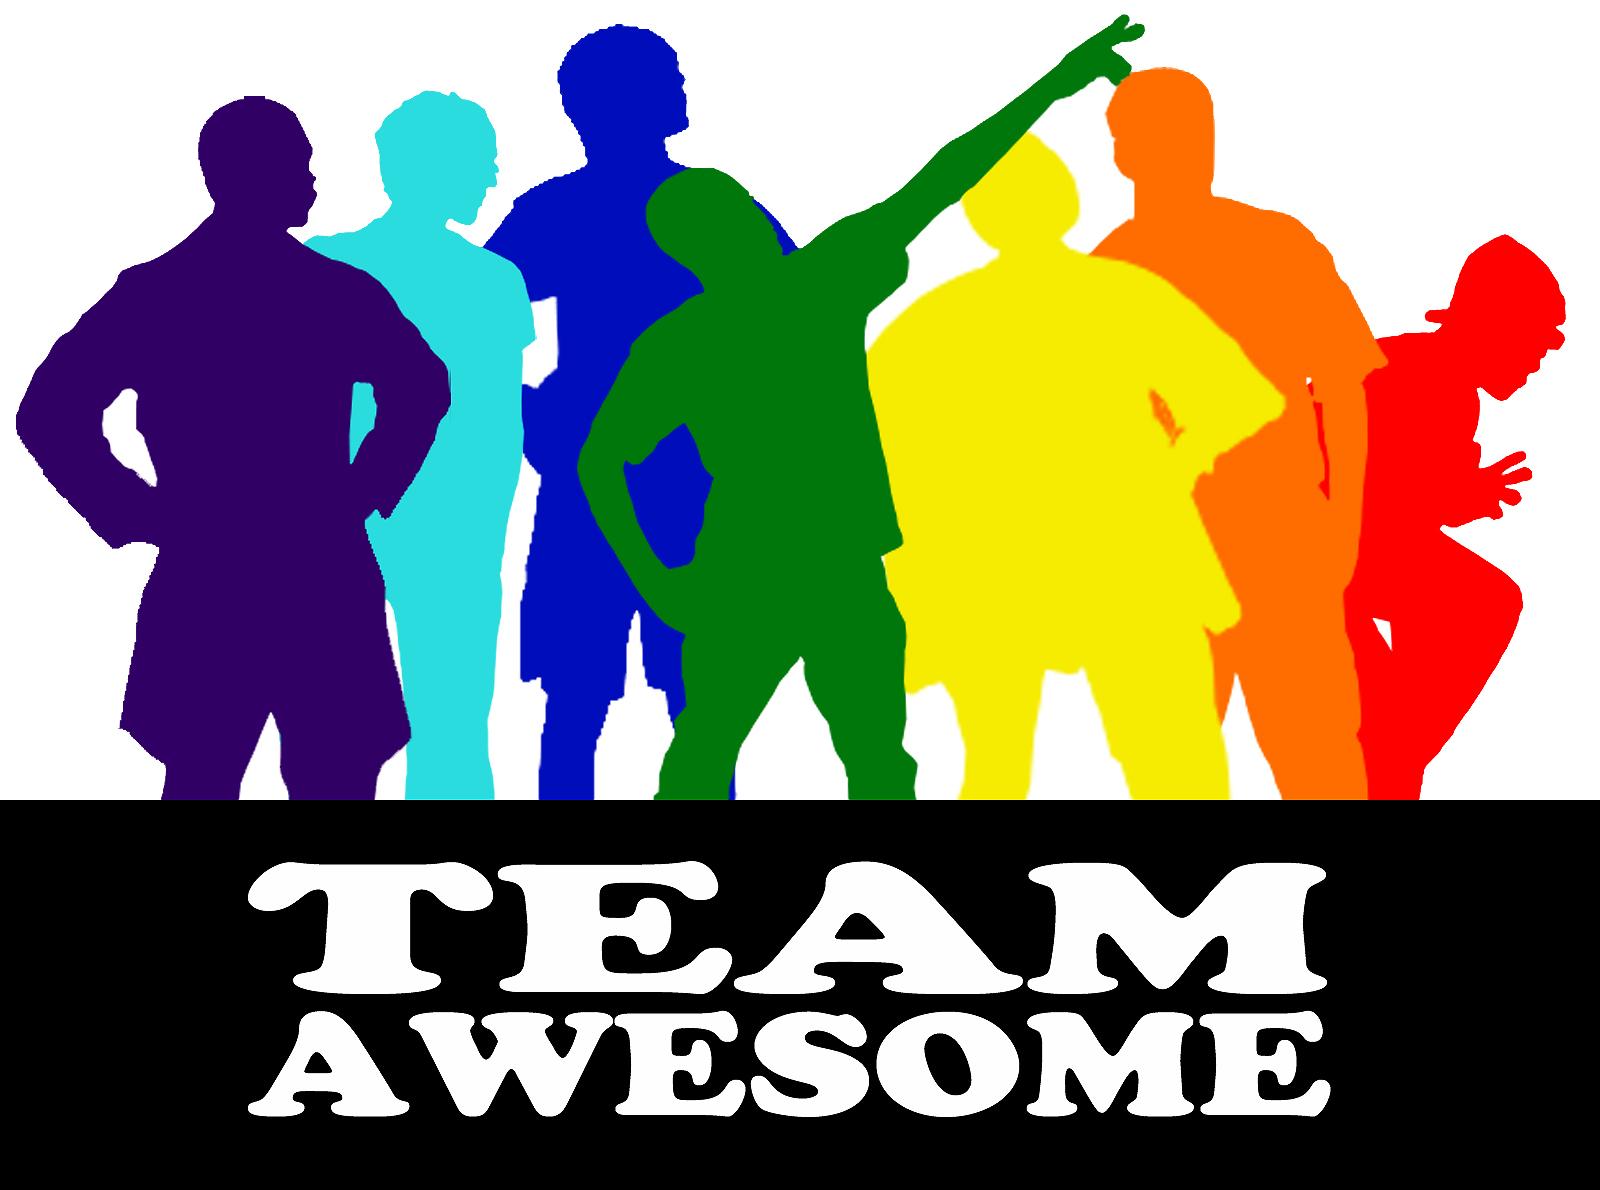 meet team awesome logo